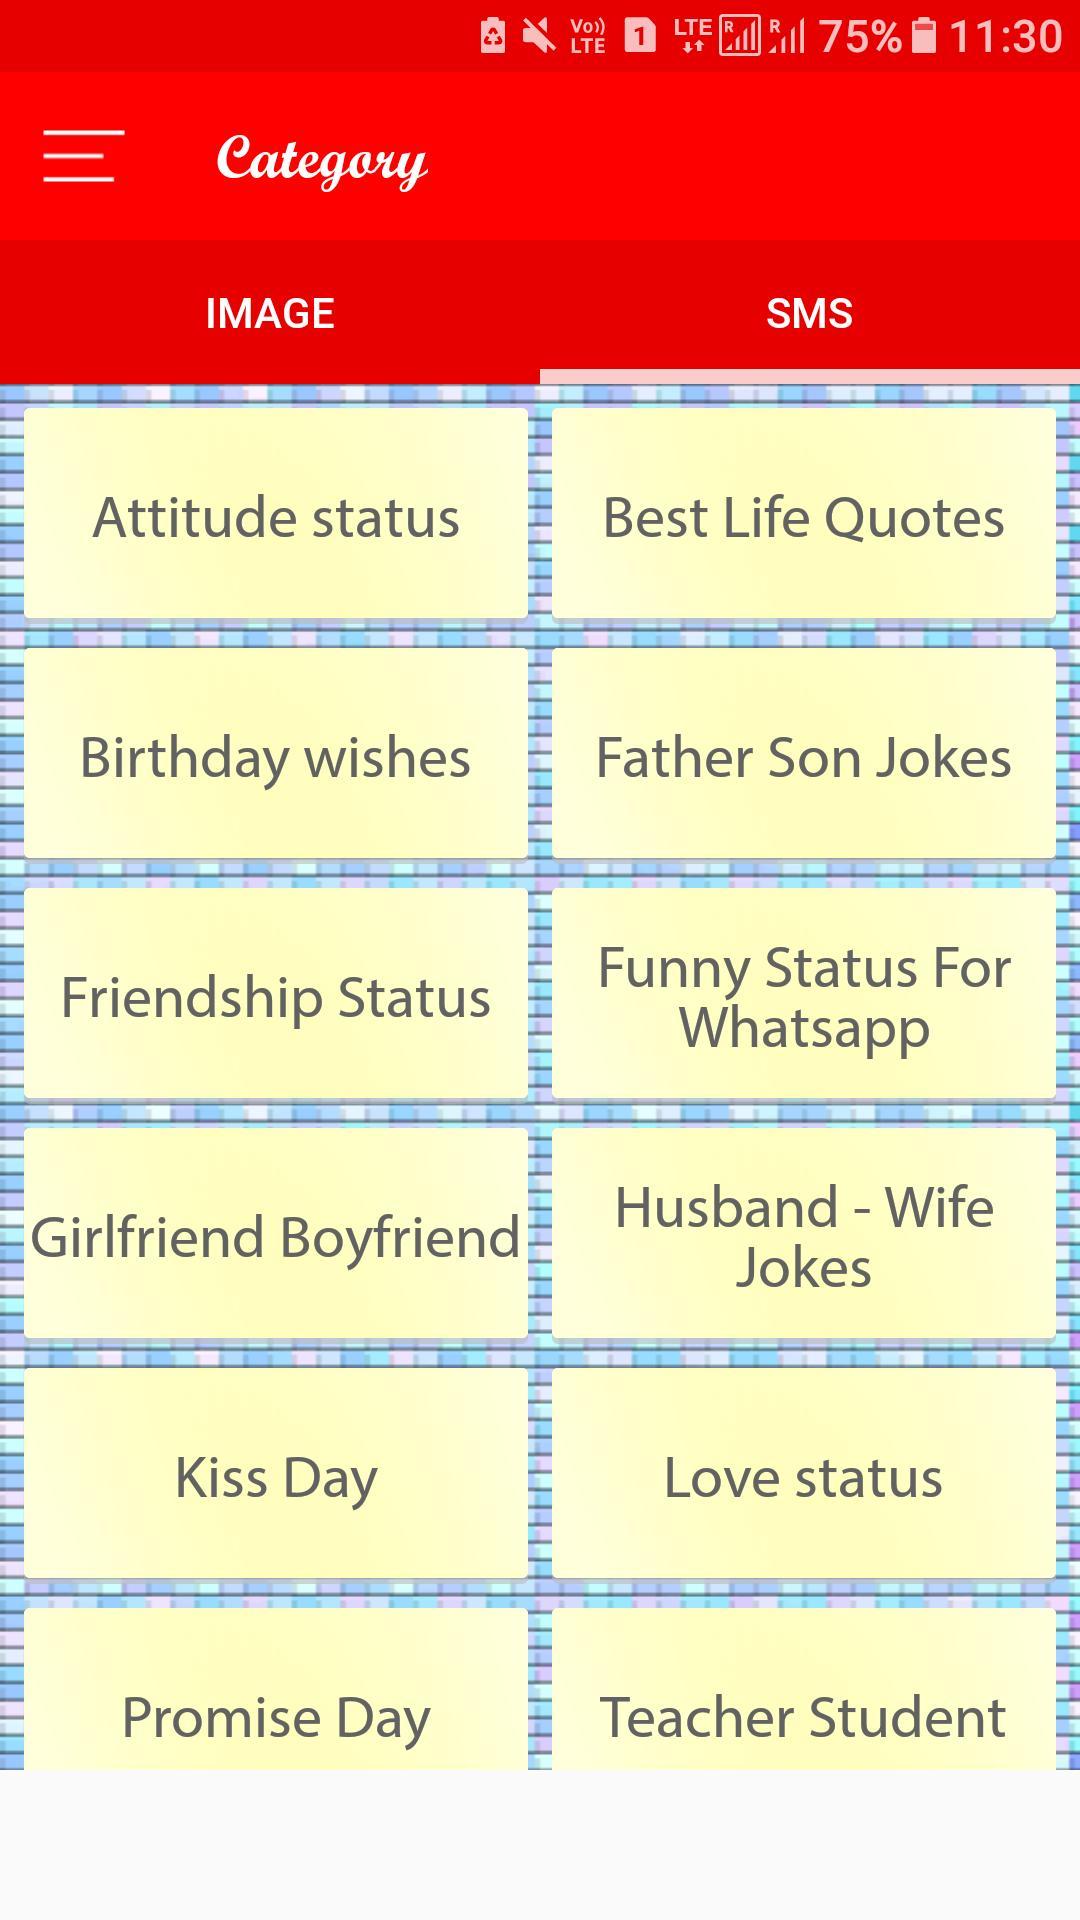 Latest Joks Hindi Shayari, Quotes Love Meter for Android - APK Download